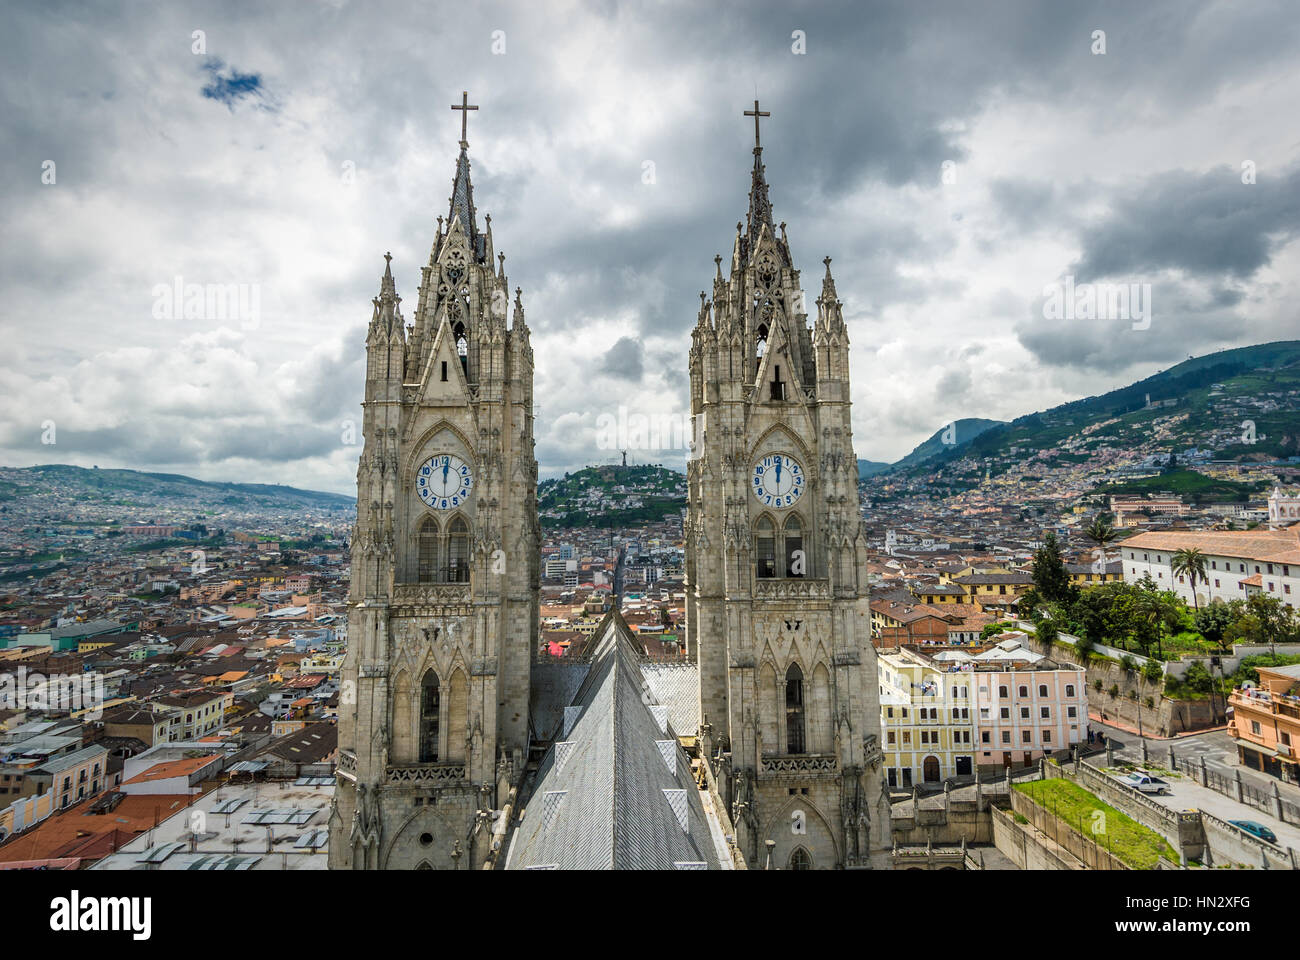 Basilica del Voto Nacional, Quito, Ecuador - Stock Image